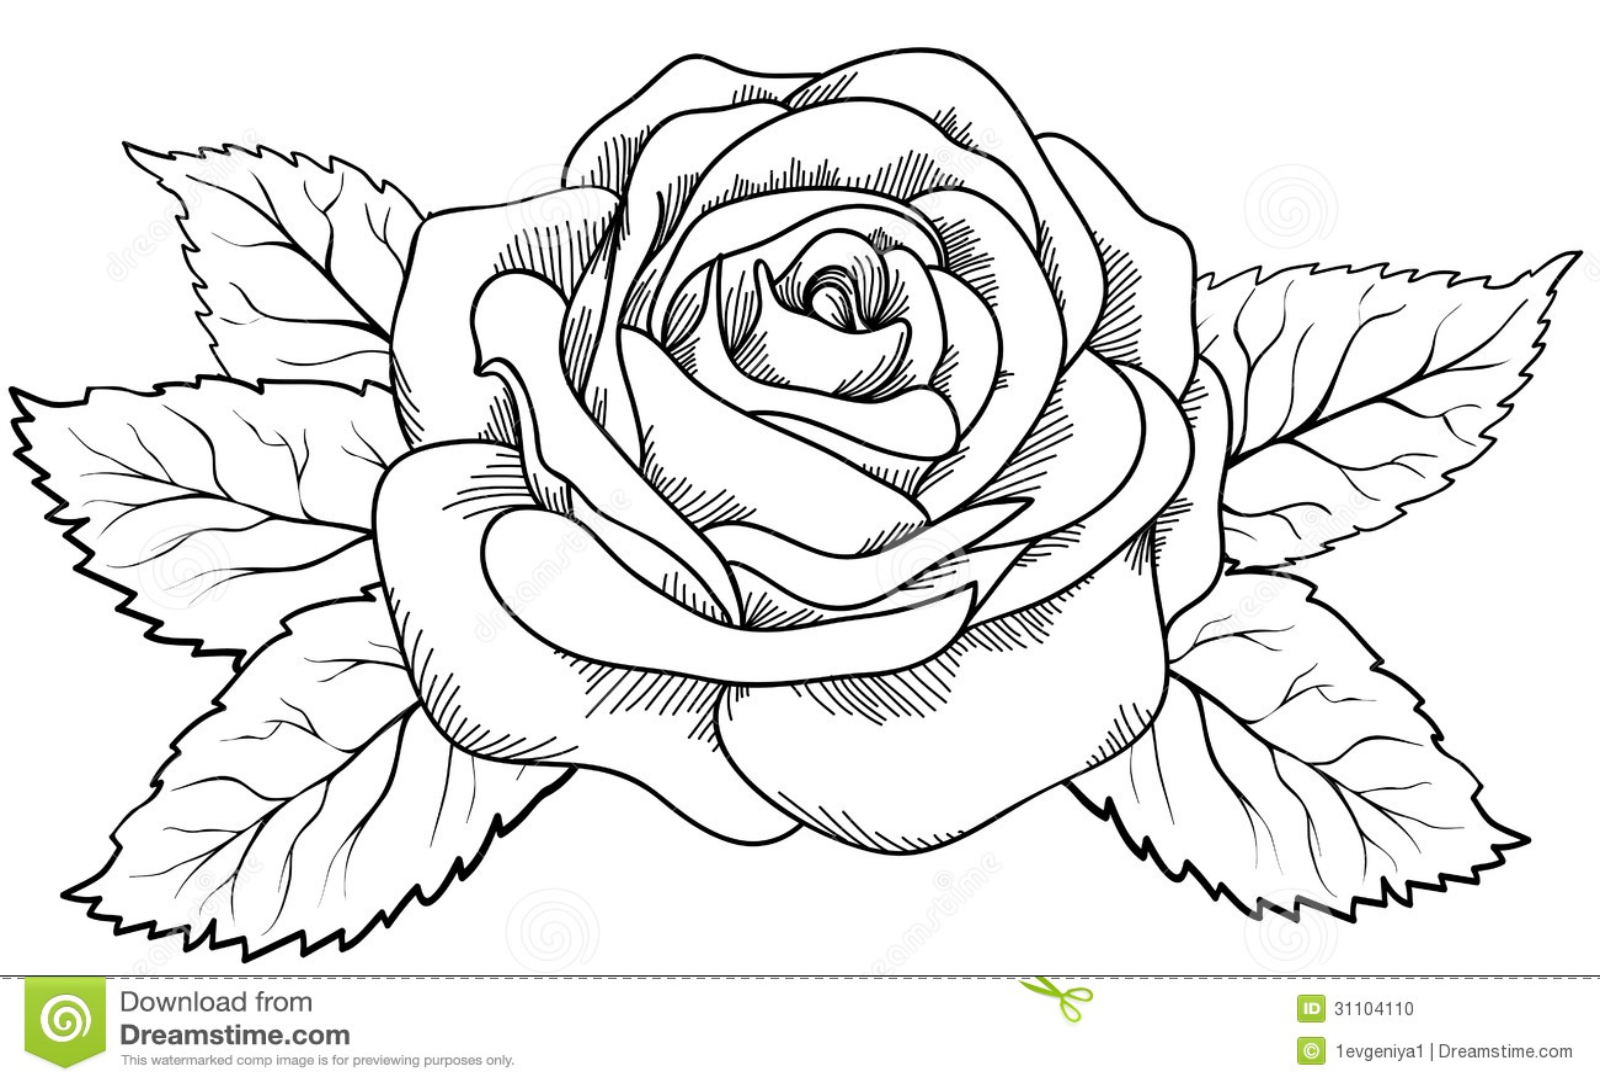 knumathise: Realistic Rose Drawing Outline Images